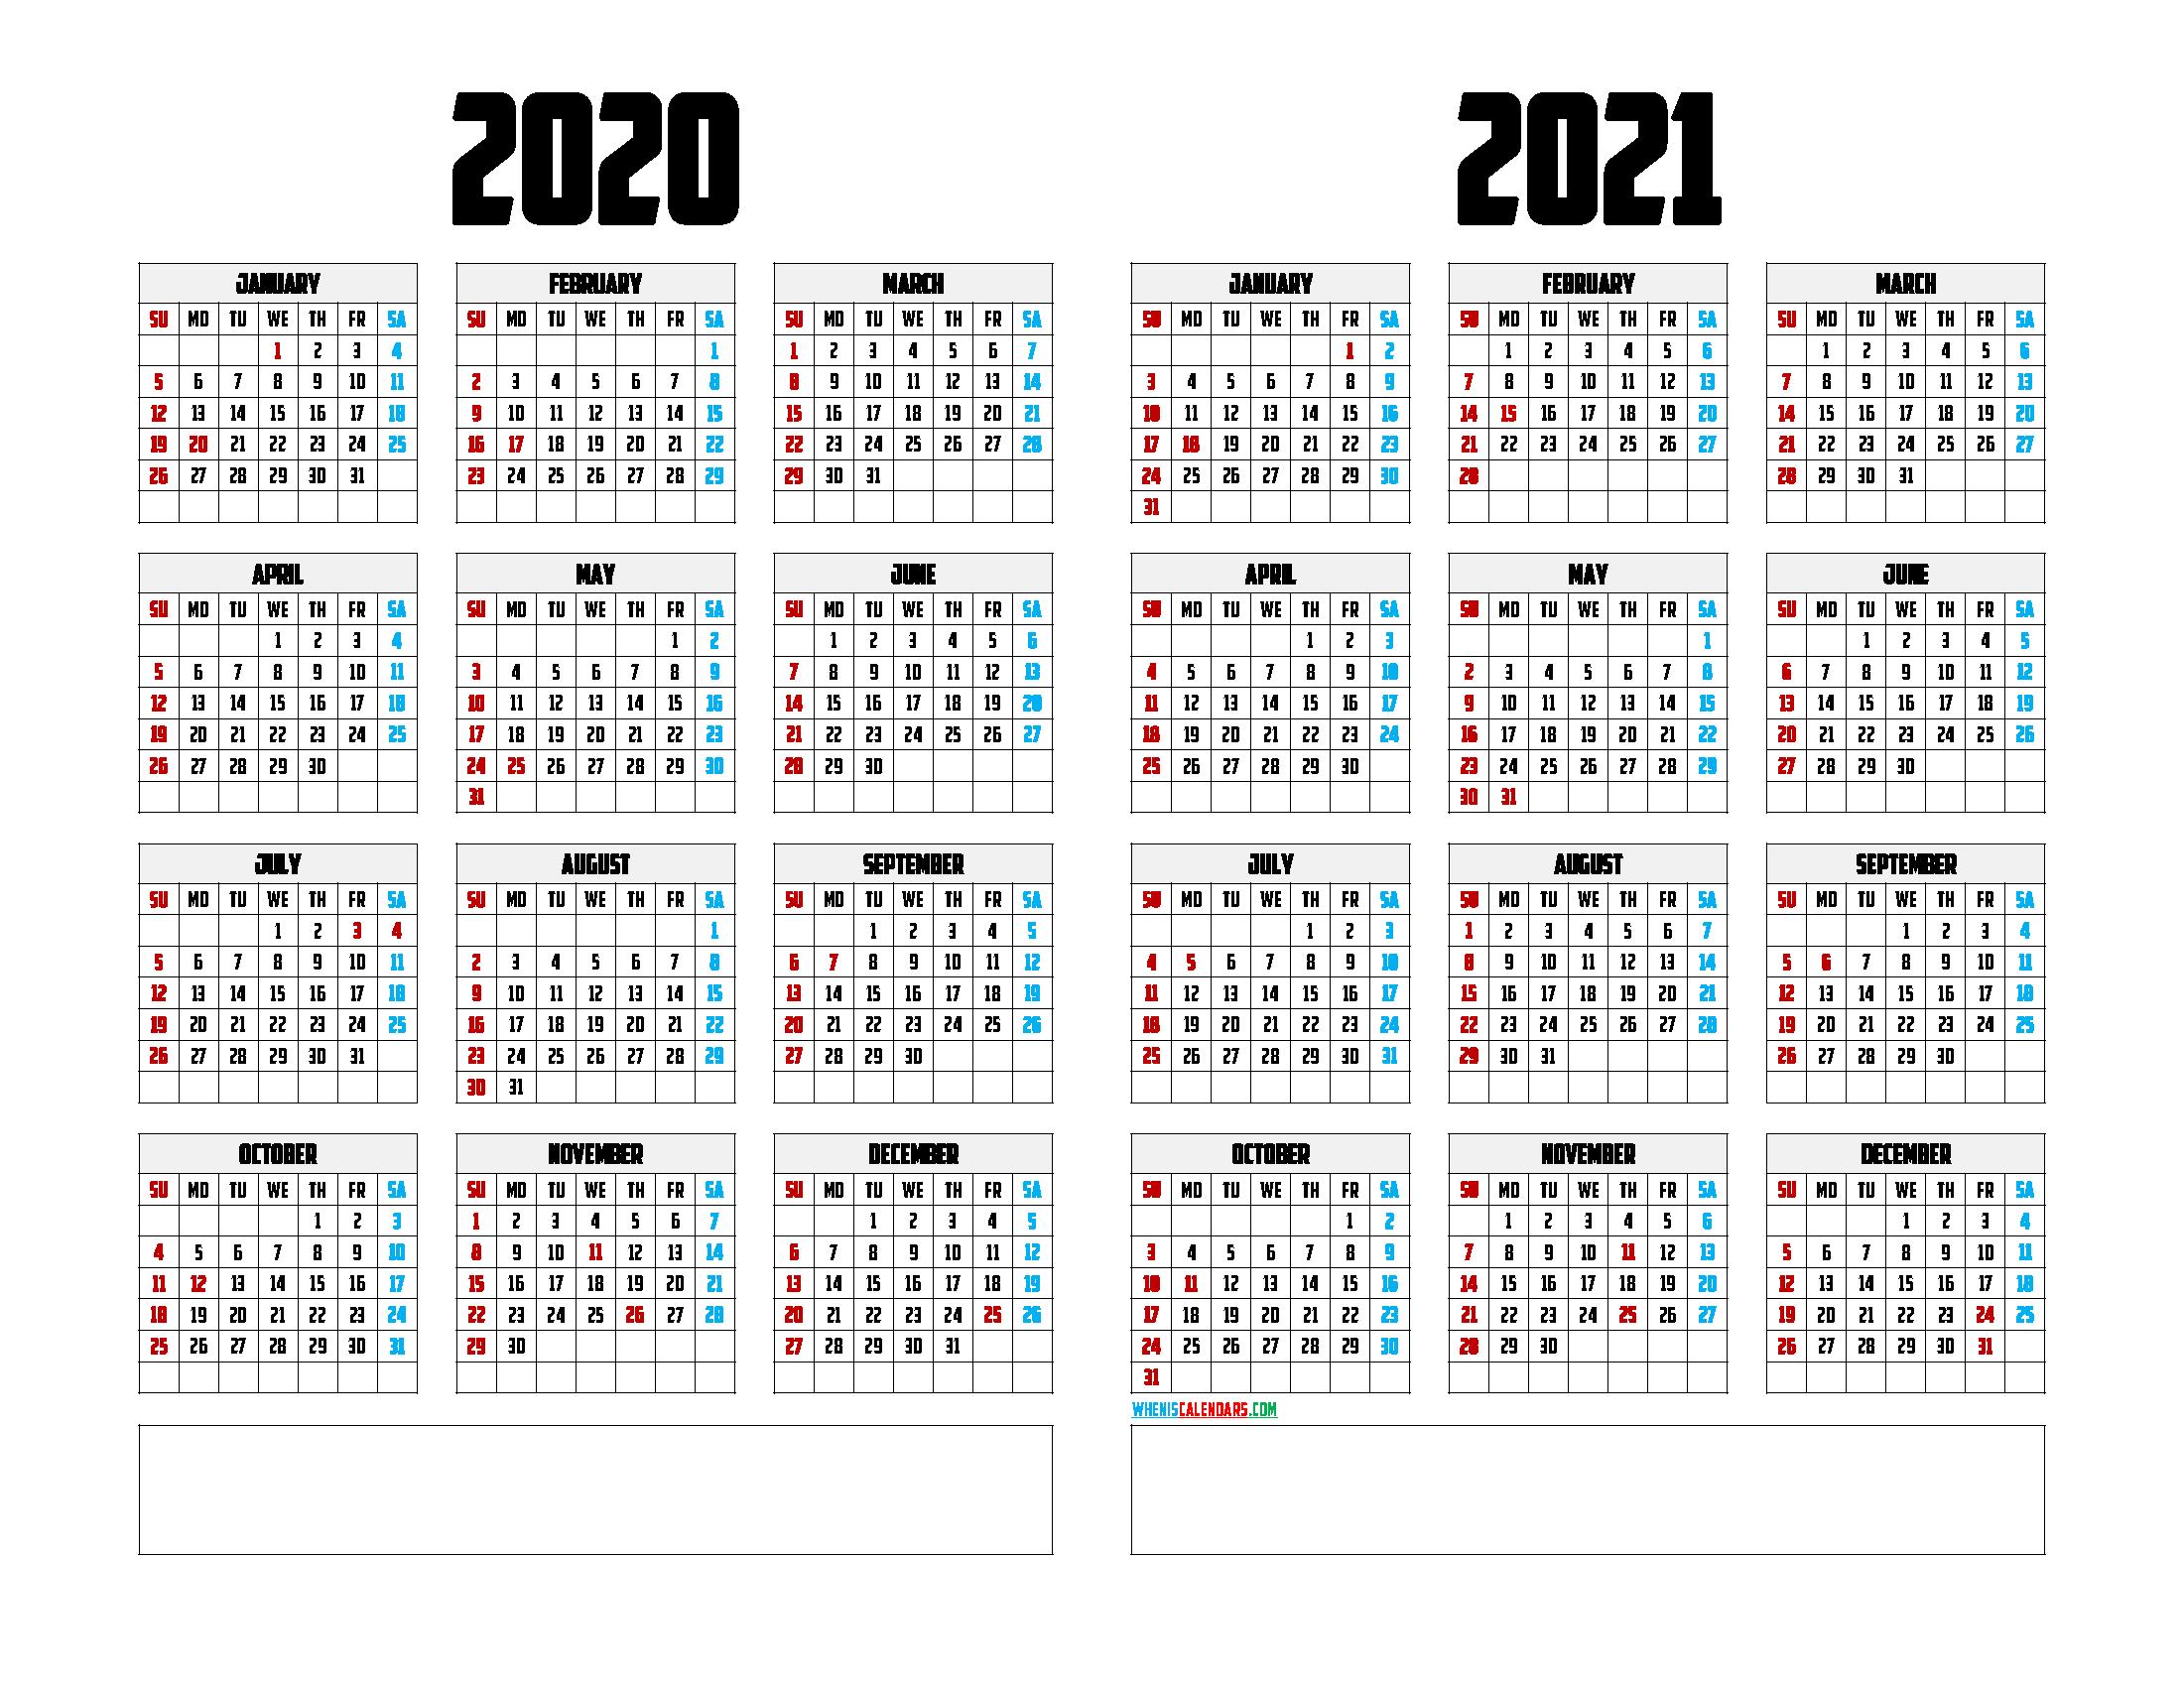 Printable 2020 and 2021 Calendar Template